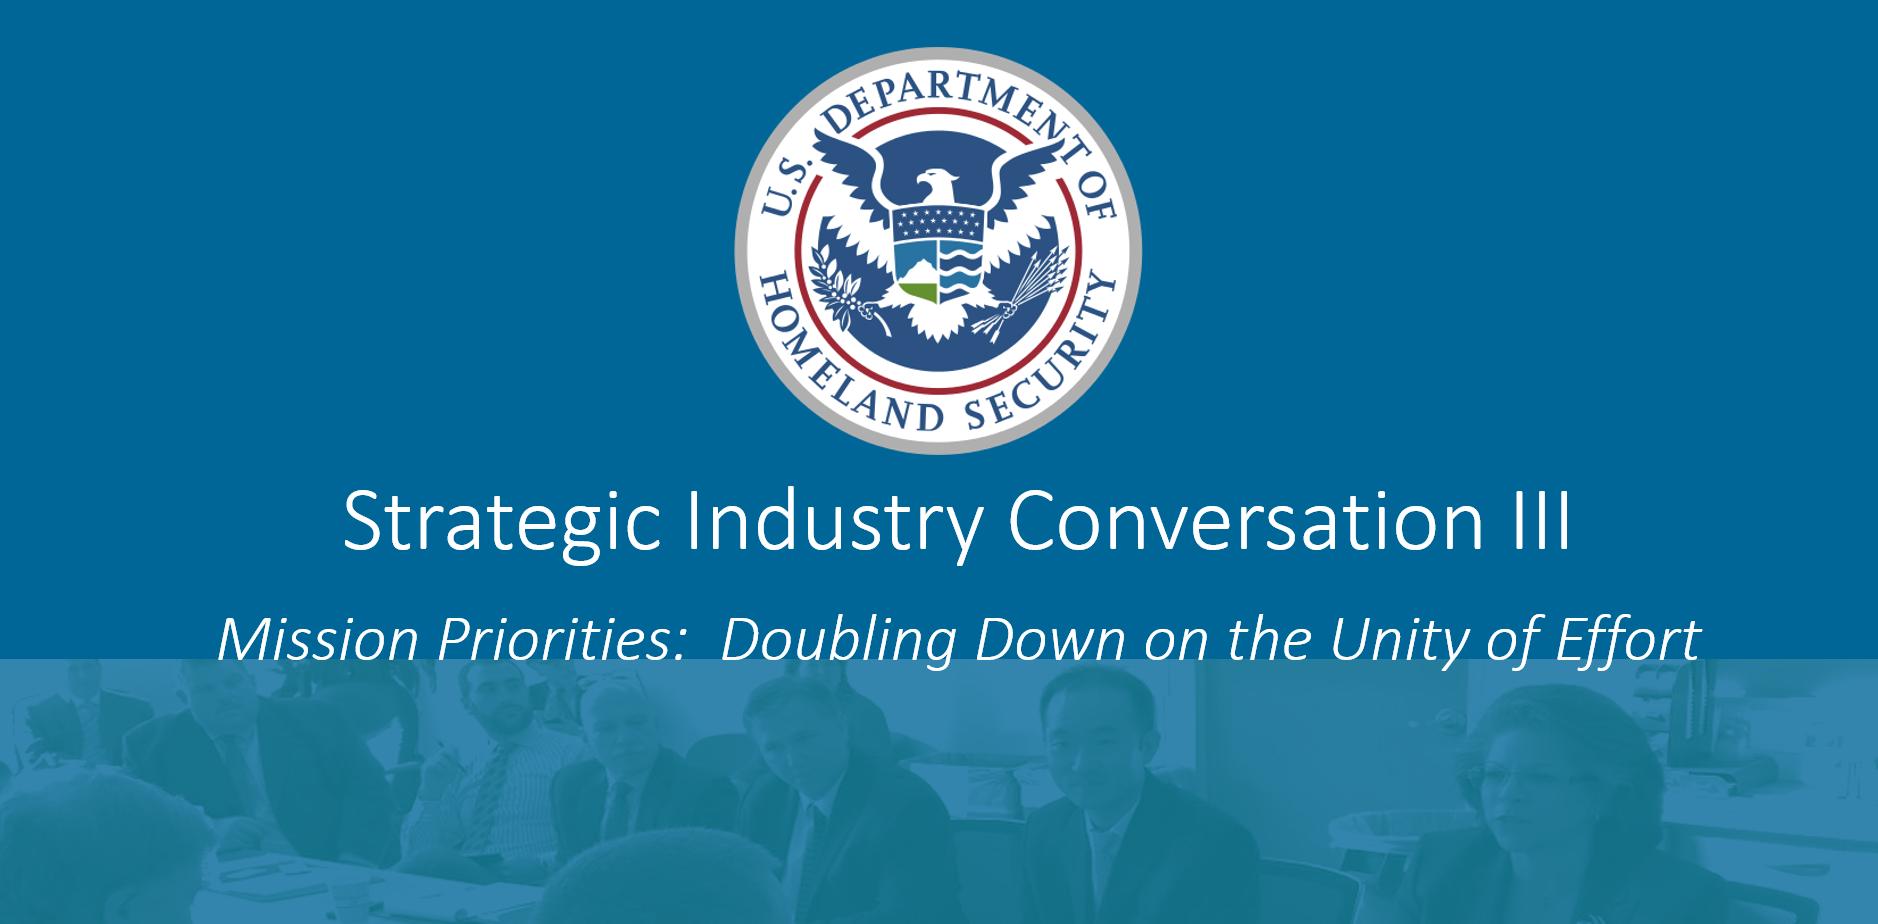 Strategic Industry Conversation III